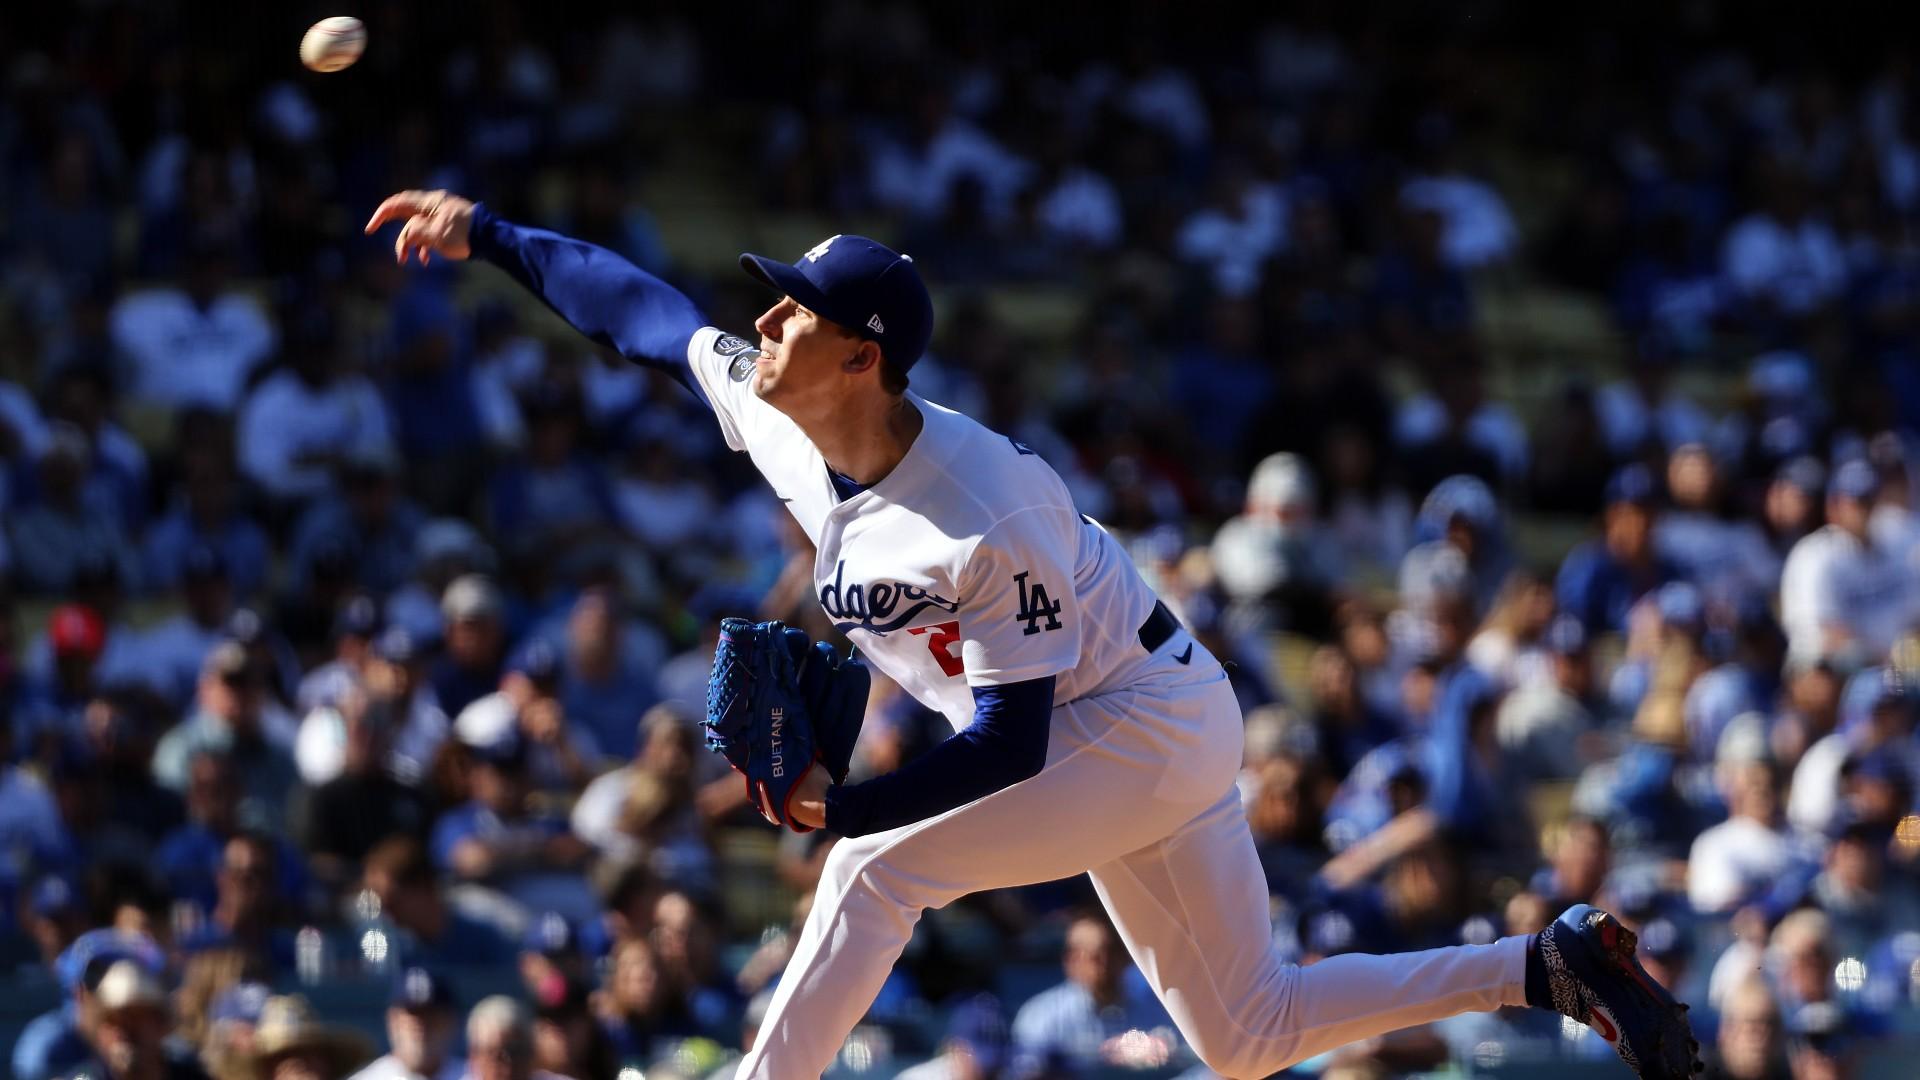 Dodgers, Walker Buehler blow lead after terrible missed strike three call vs. Braves in NLCS